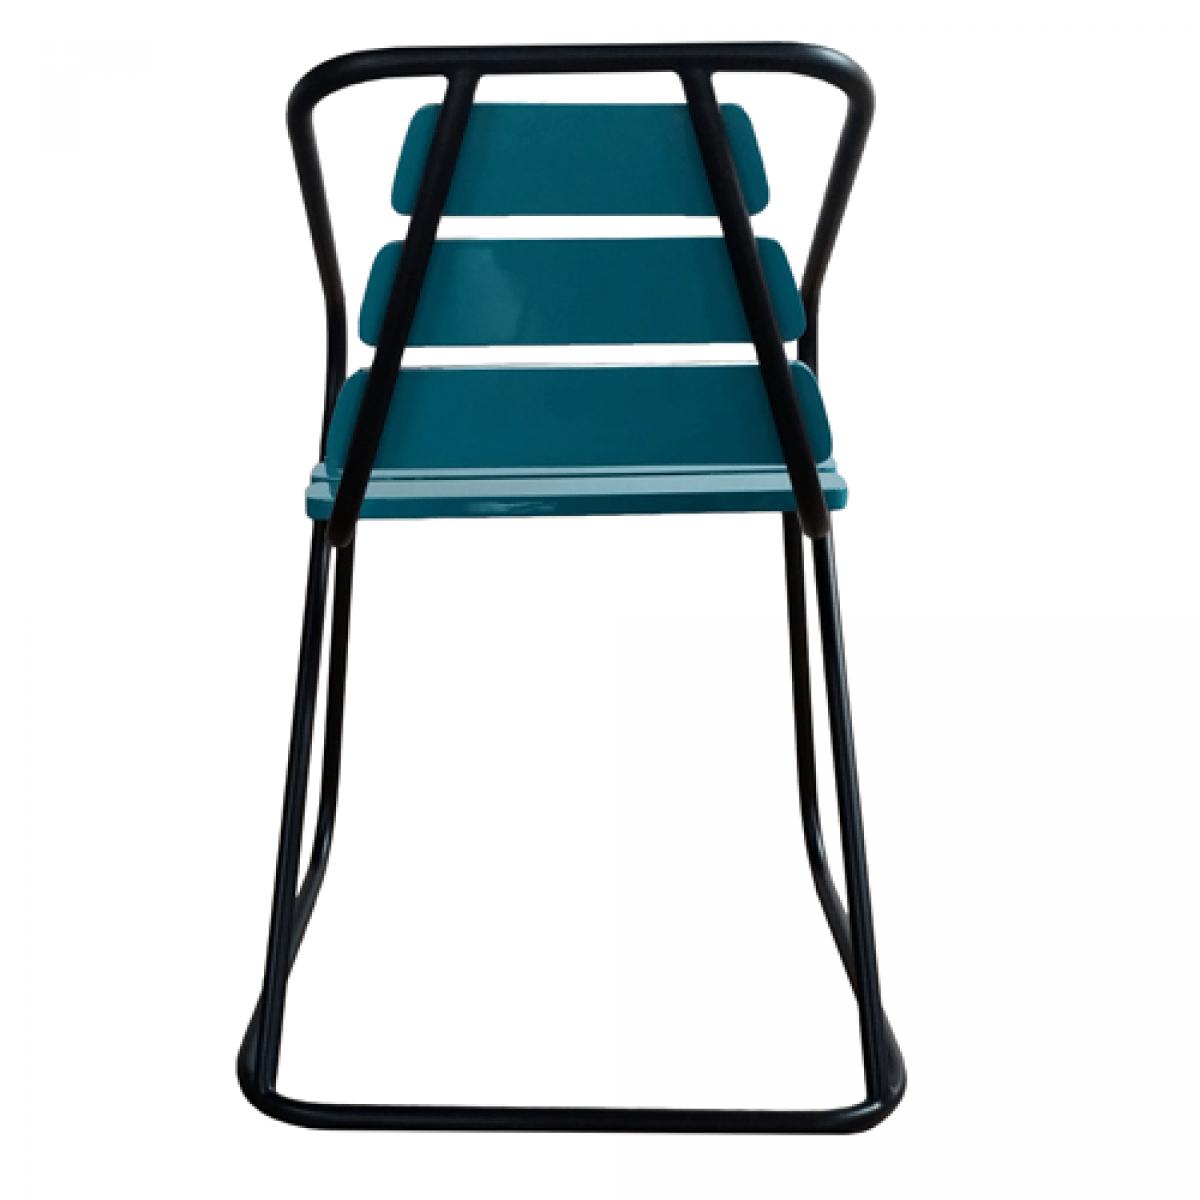 blue metal chairs amazon patio flamingo